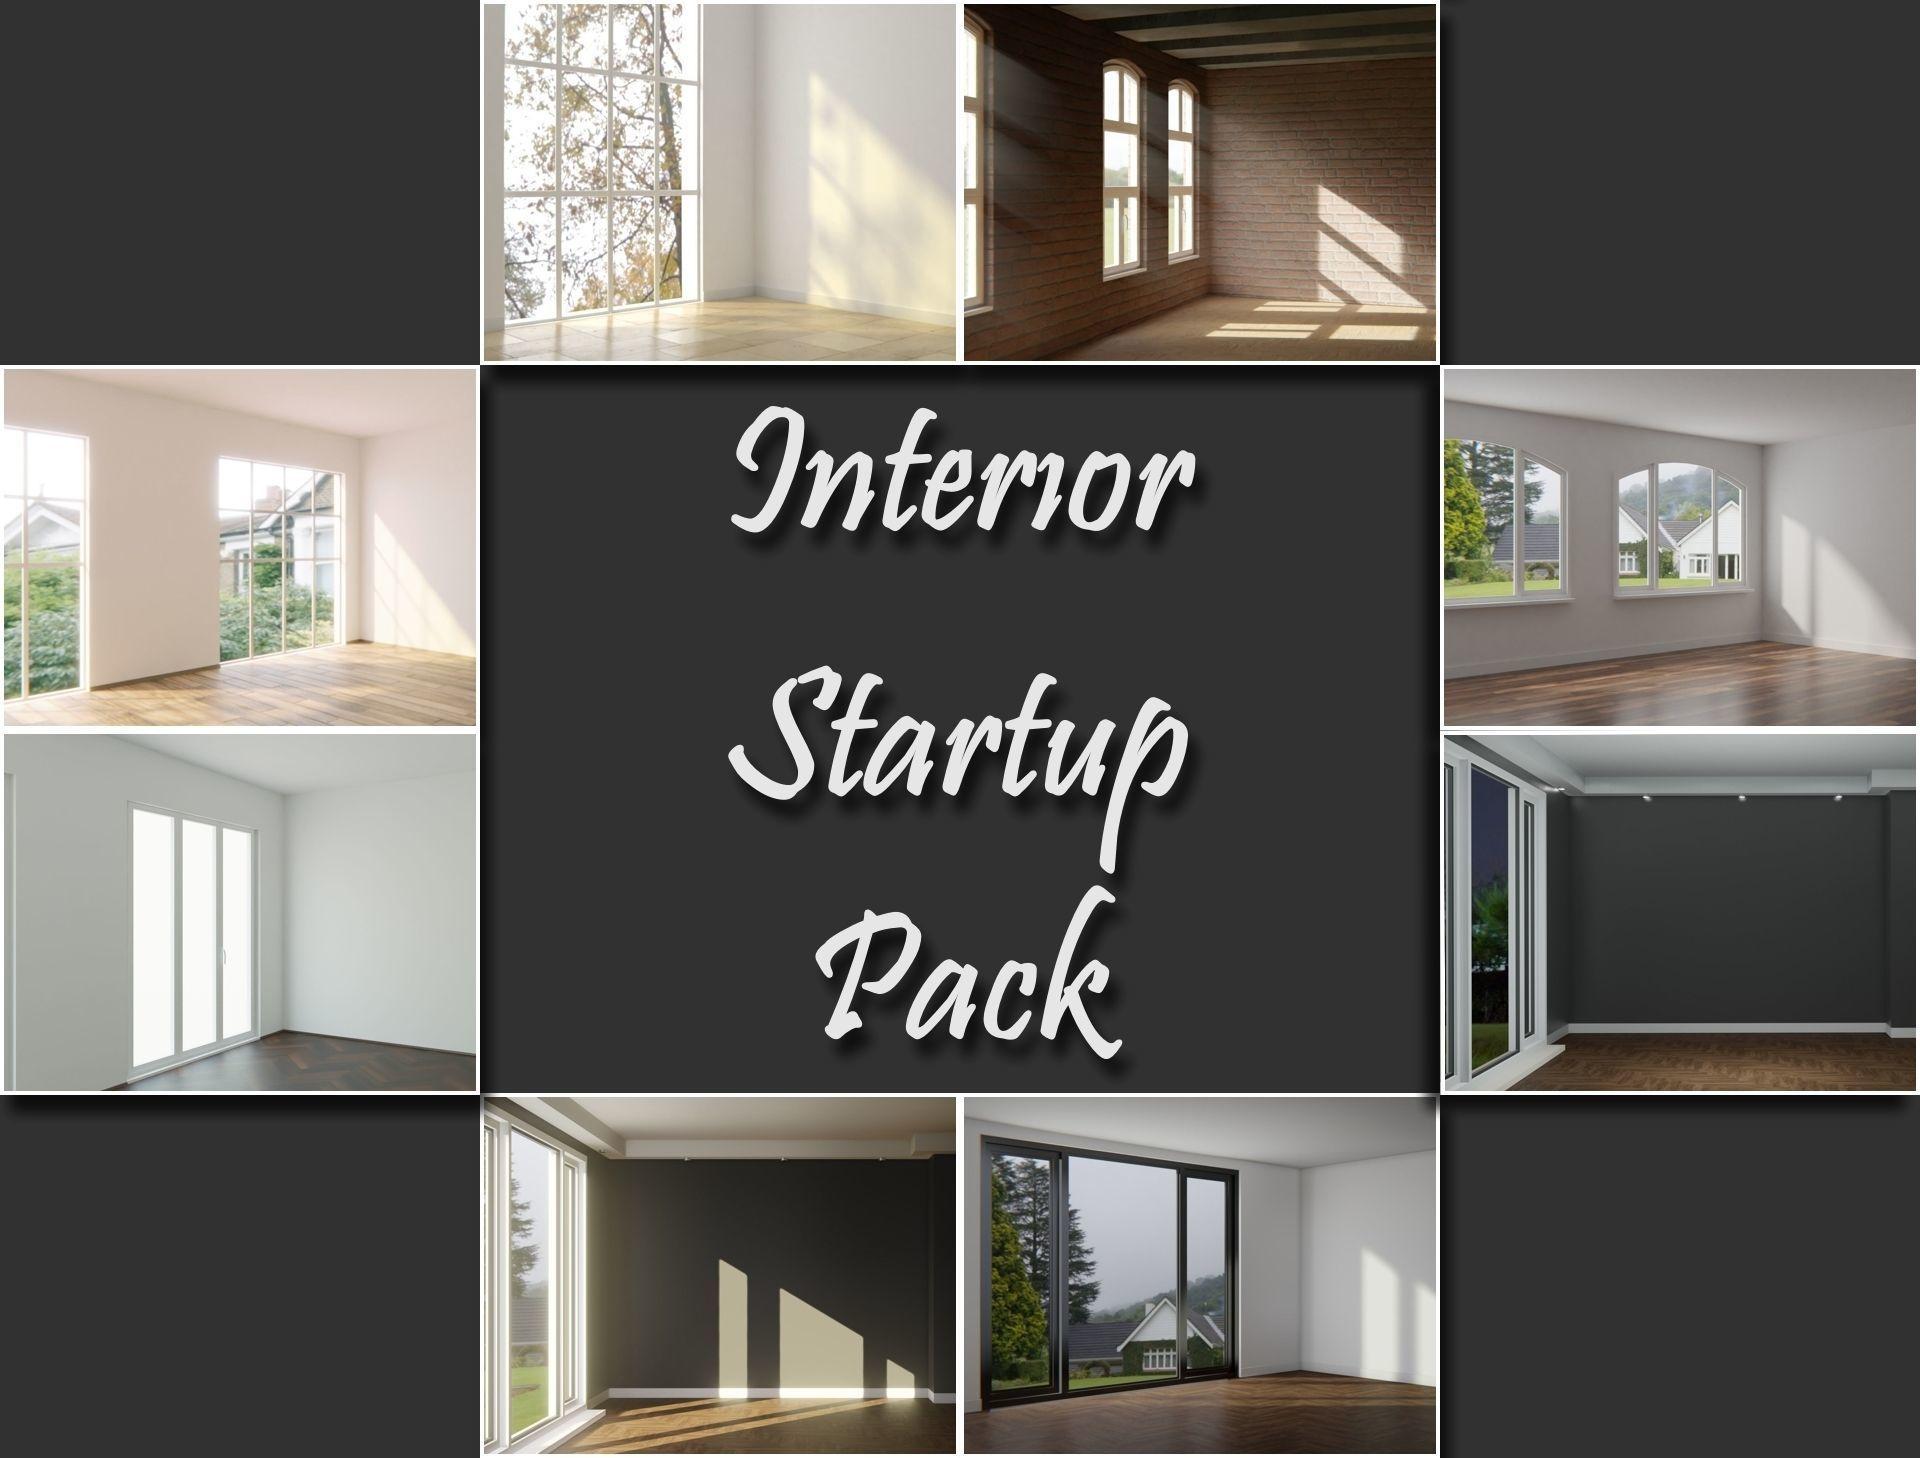 Interior Startup Pack